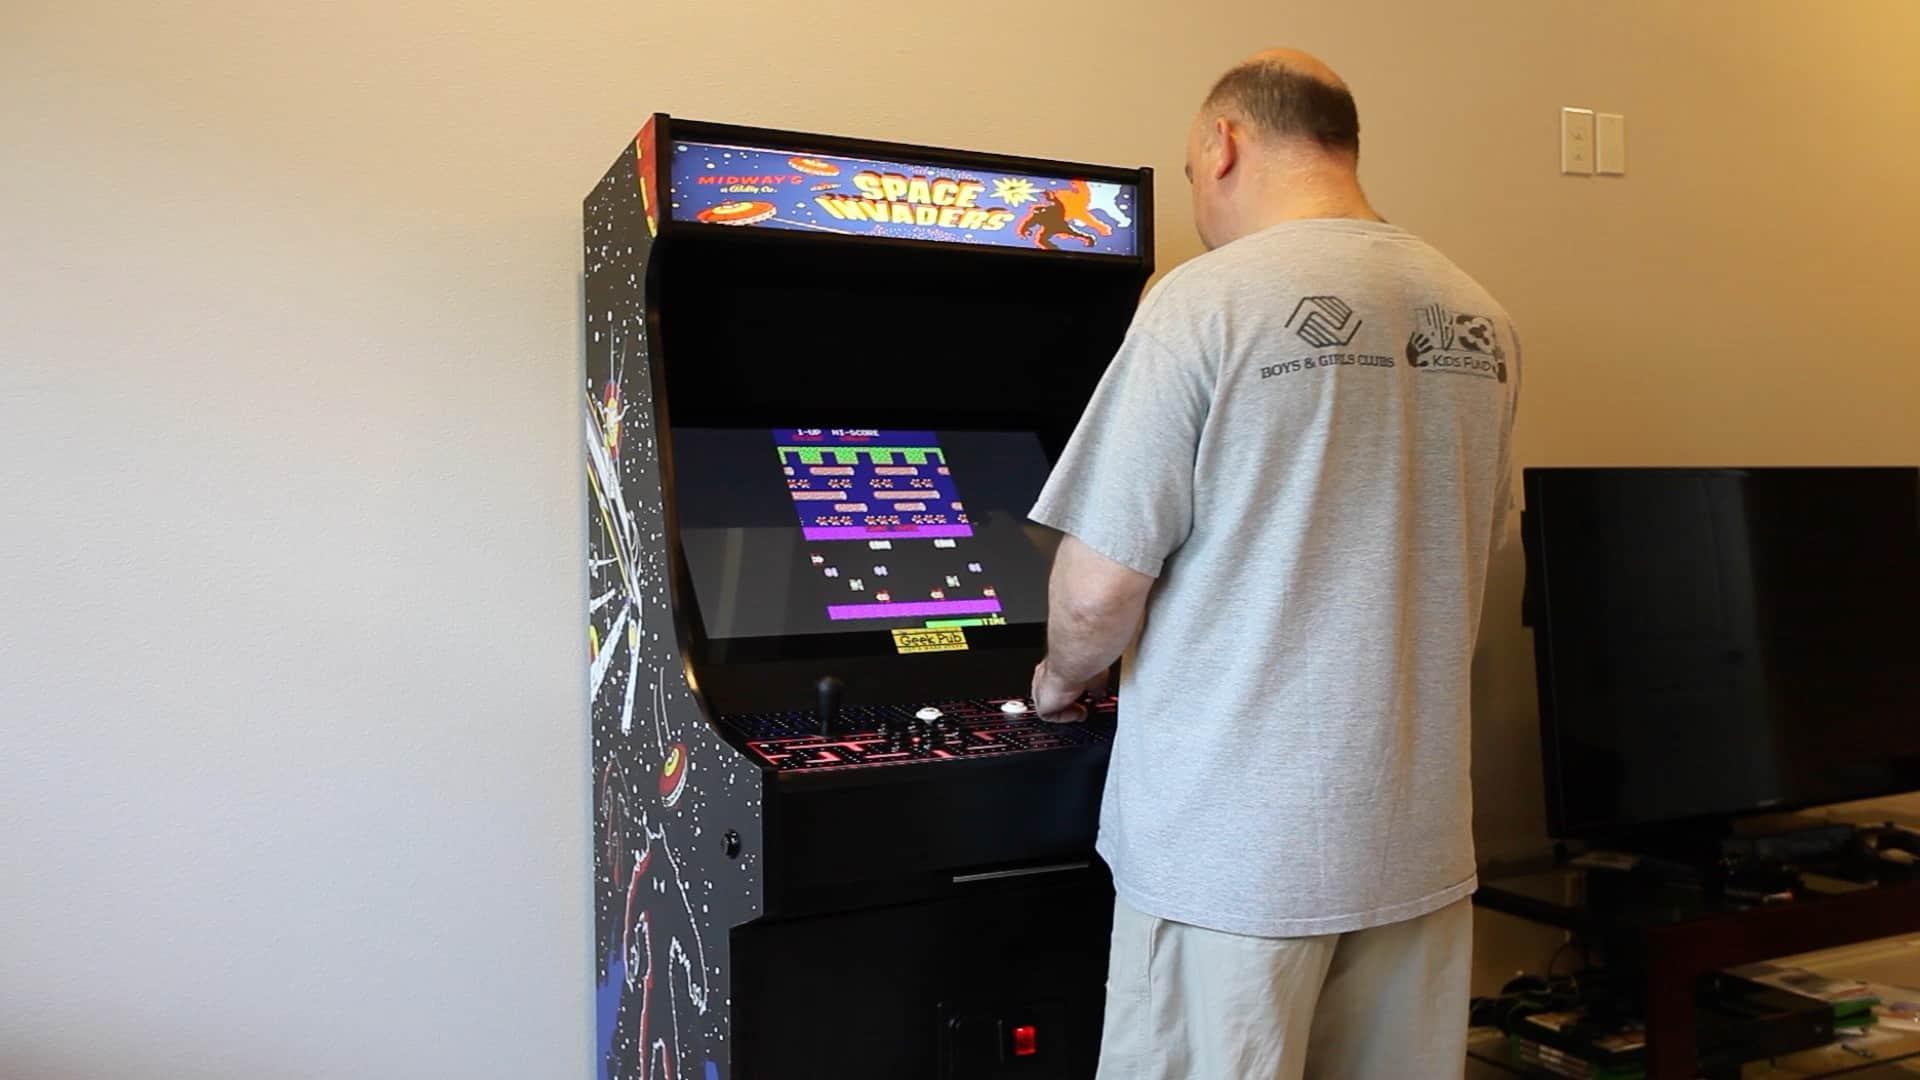 How to build an arcade machine 0305